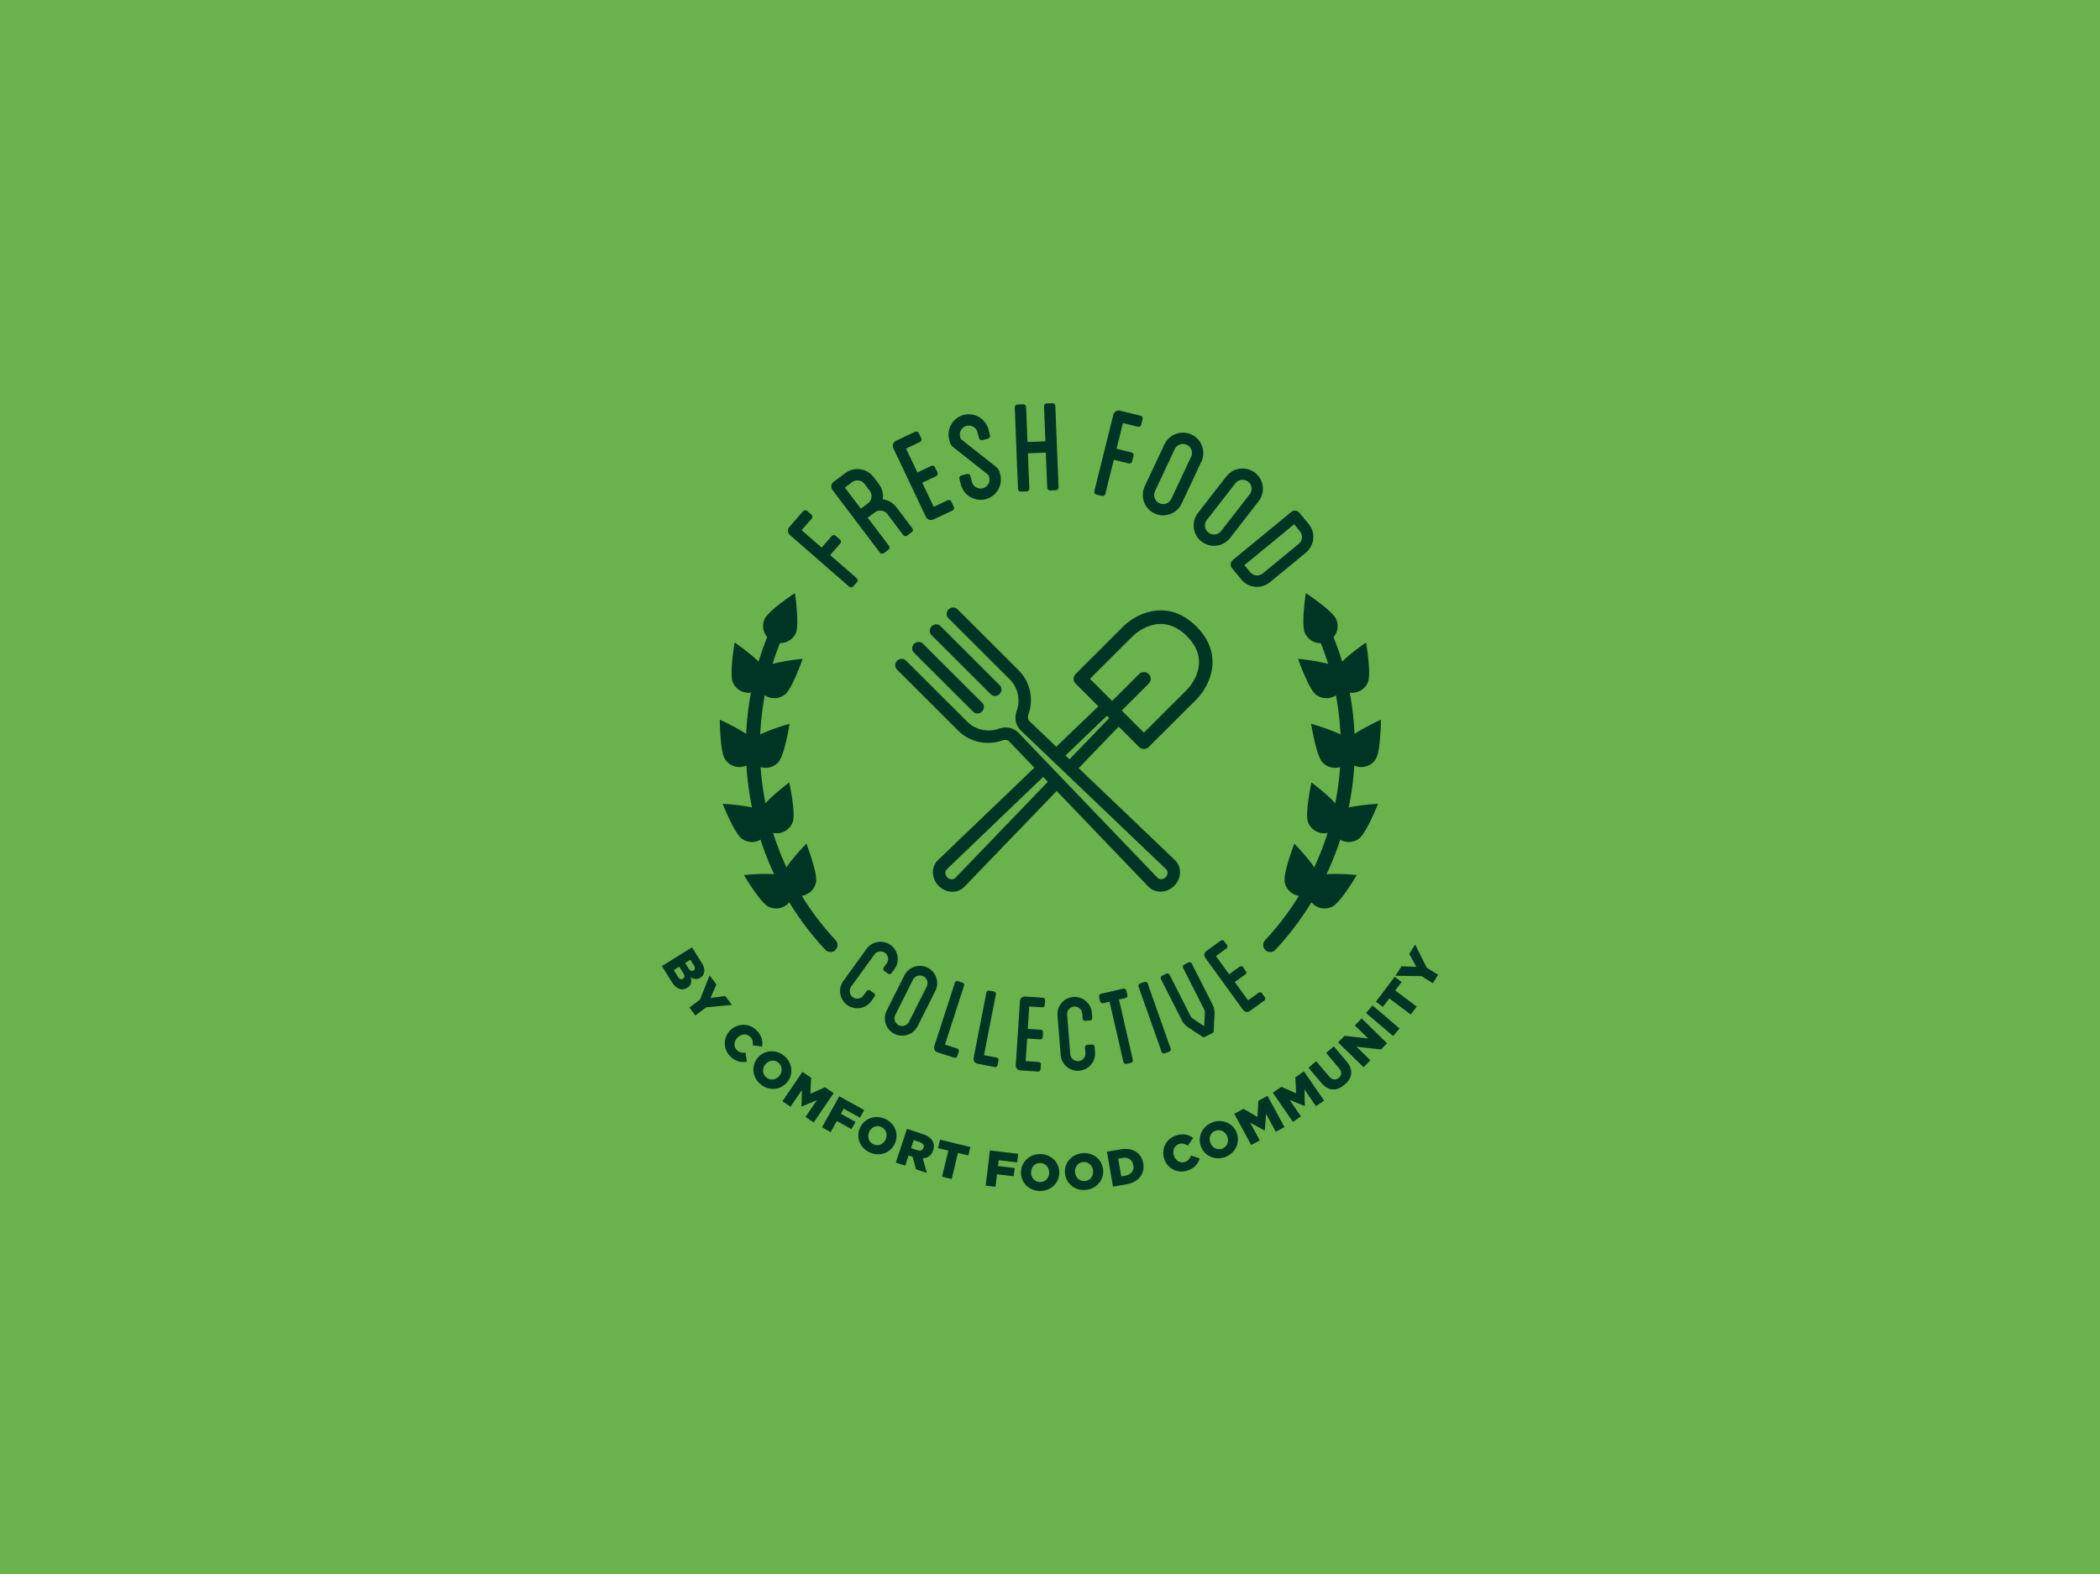 fresh food collective branding